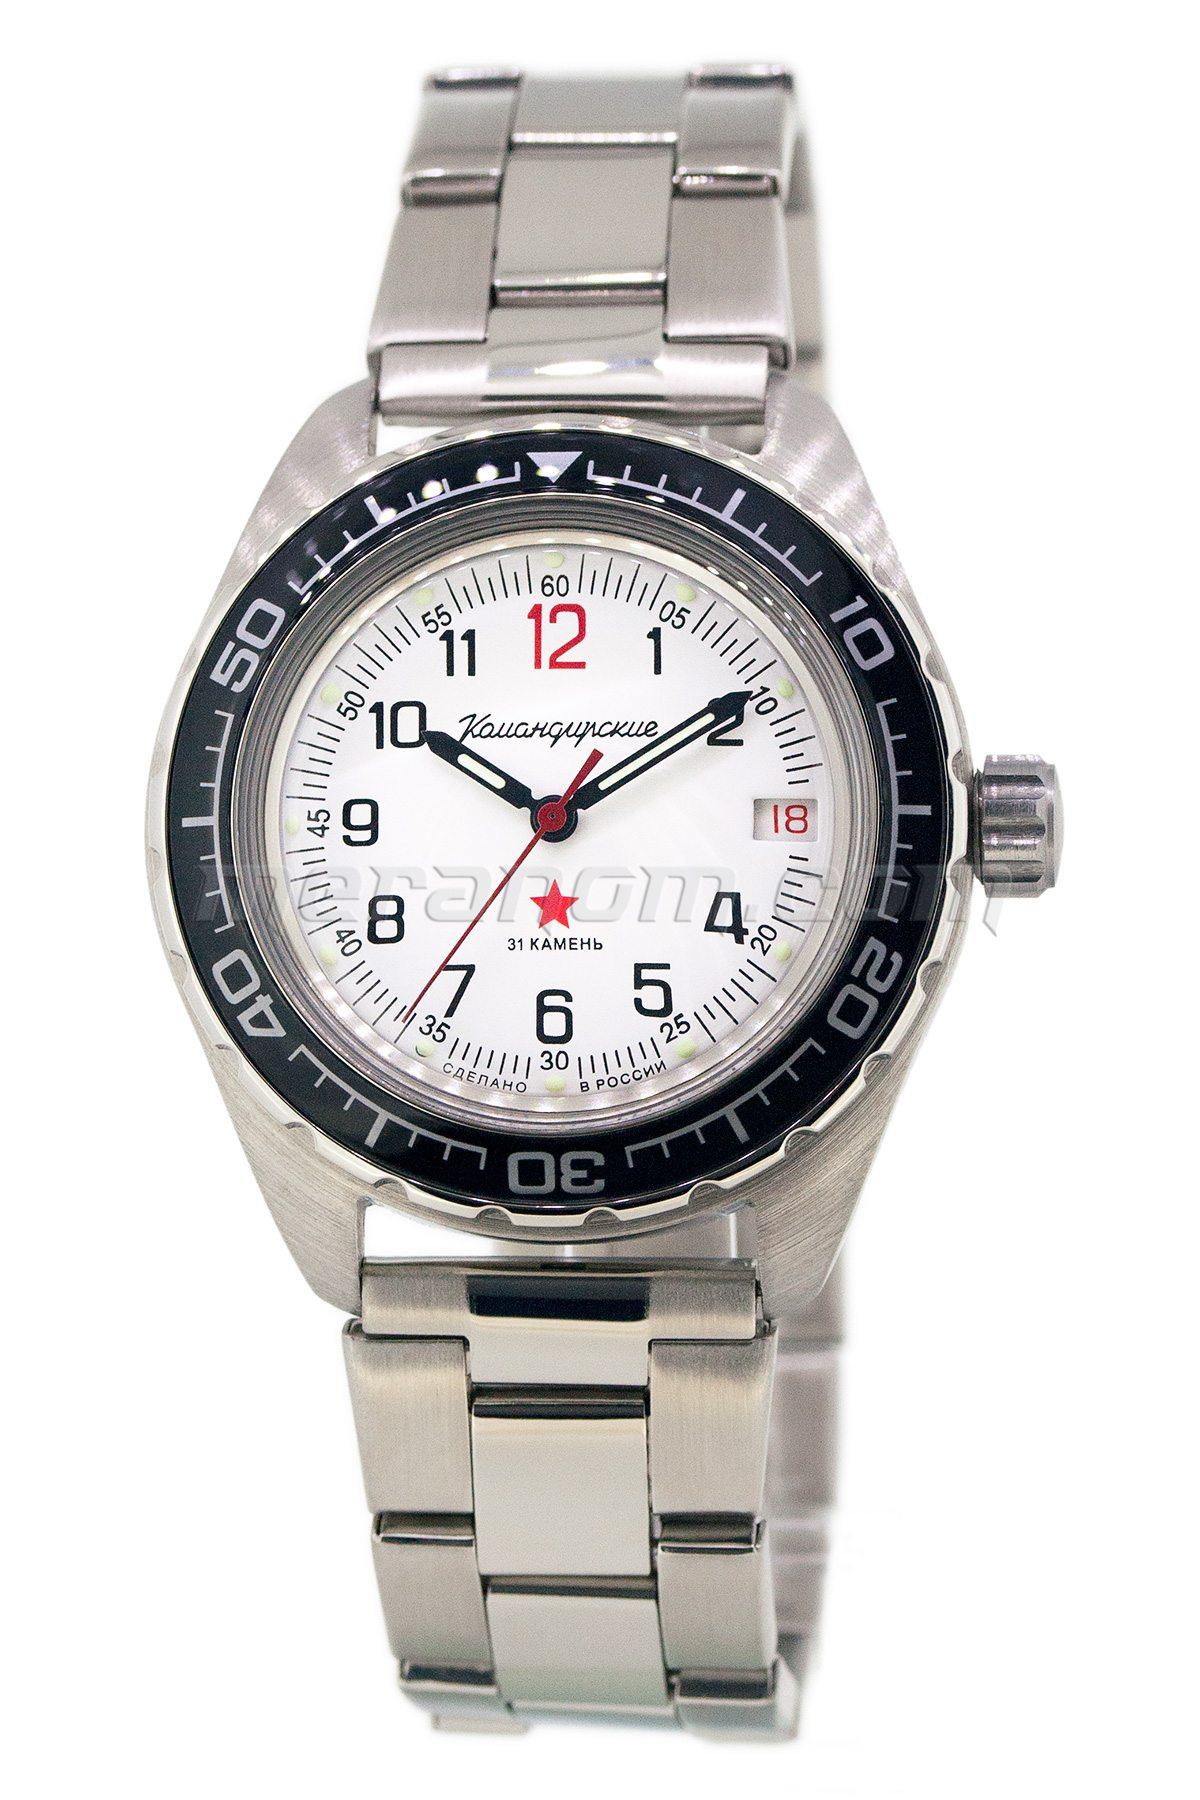 Vostok watch komandirskie 020712 buy from an authorized dealer for Komandirskie watches